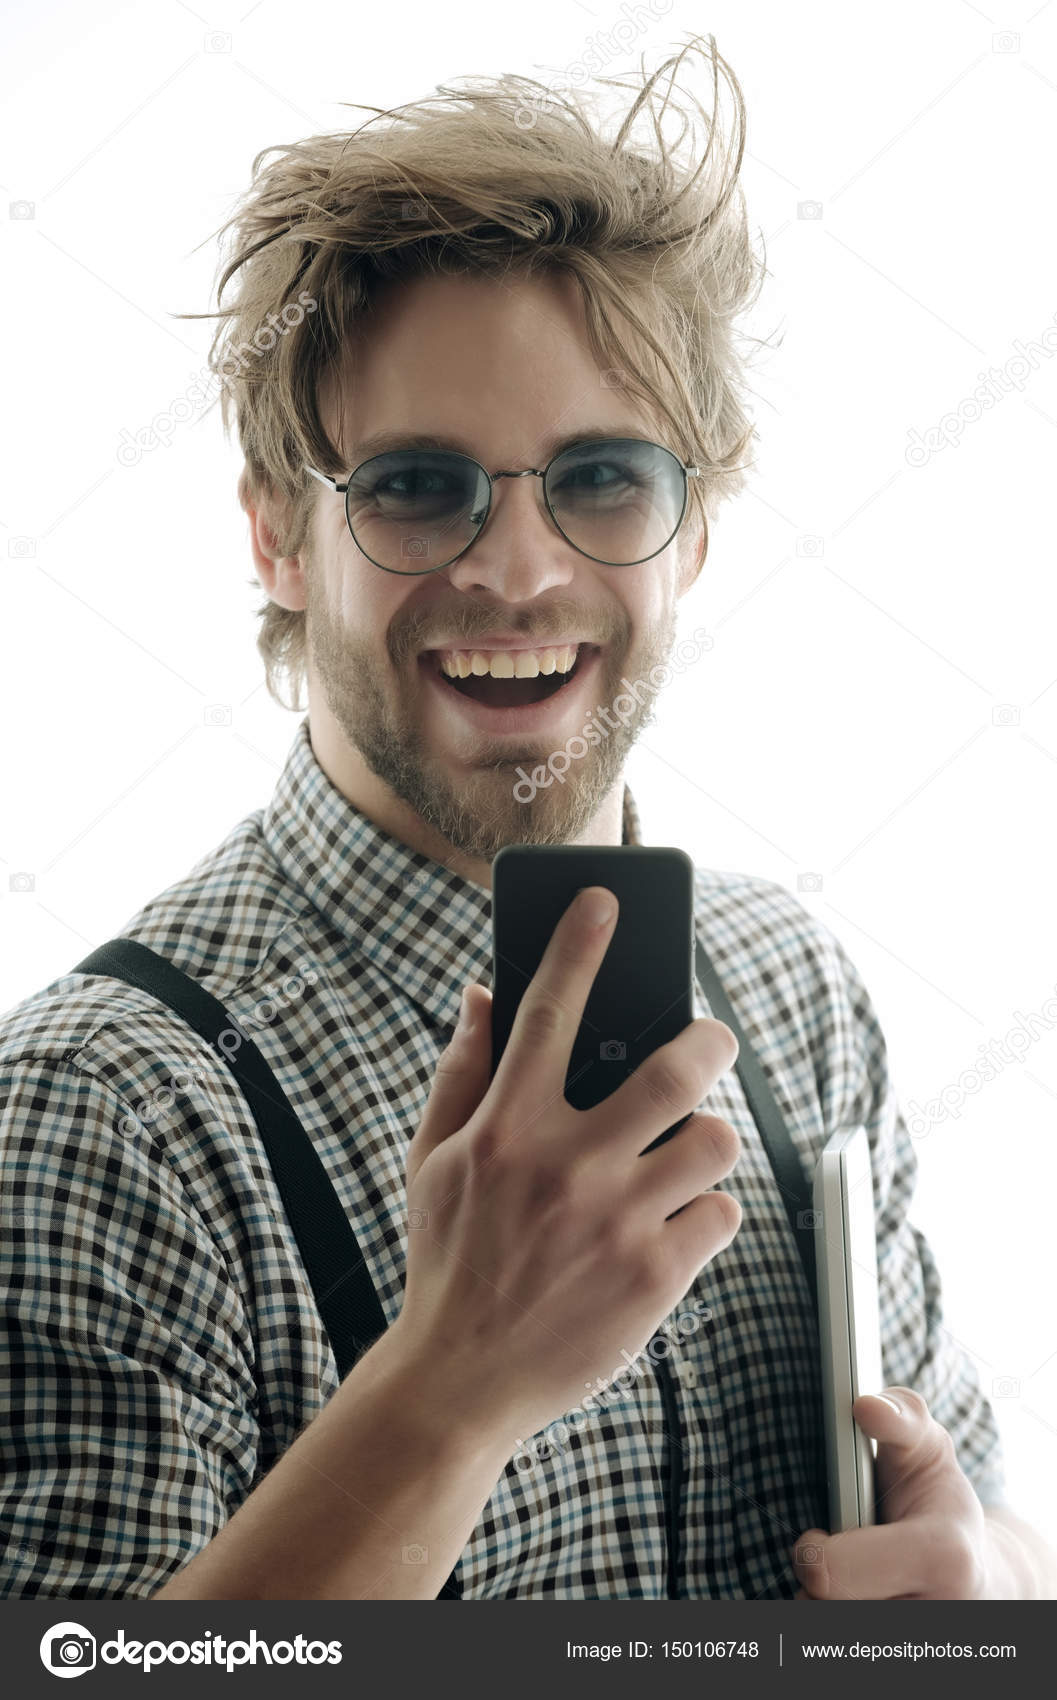 76e1c8370c Όμορφος άντρας με γυαλιά με το smartphone και το φορητό υπολογιστή ...